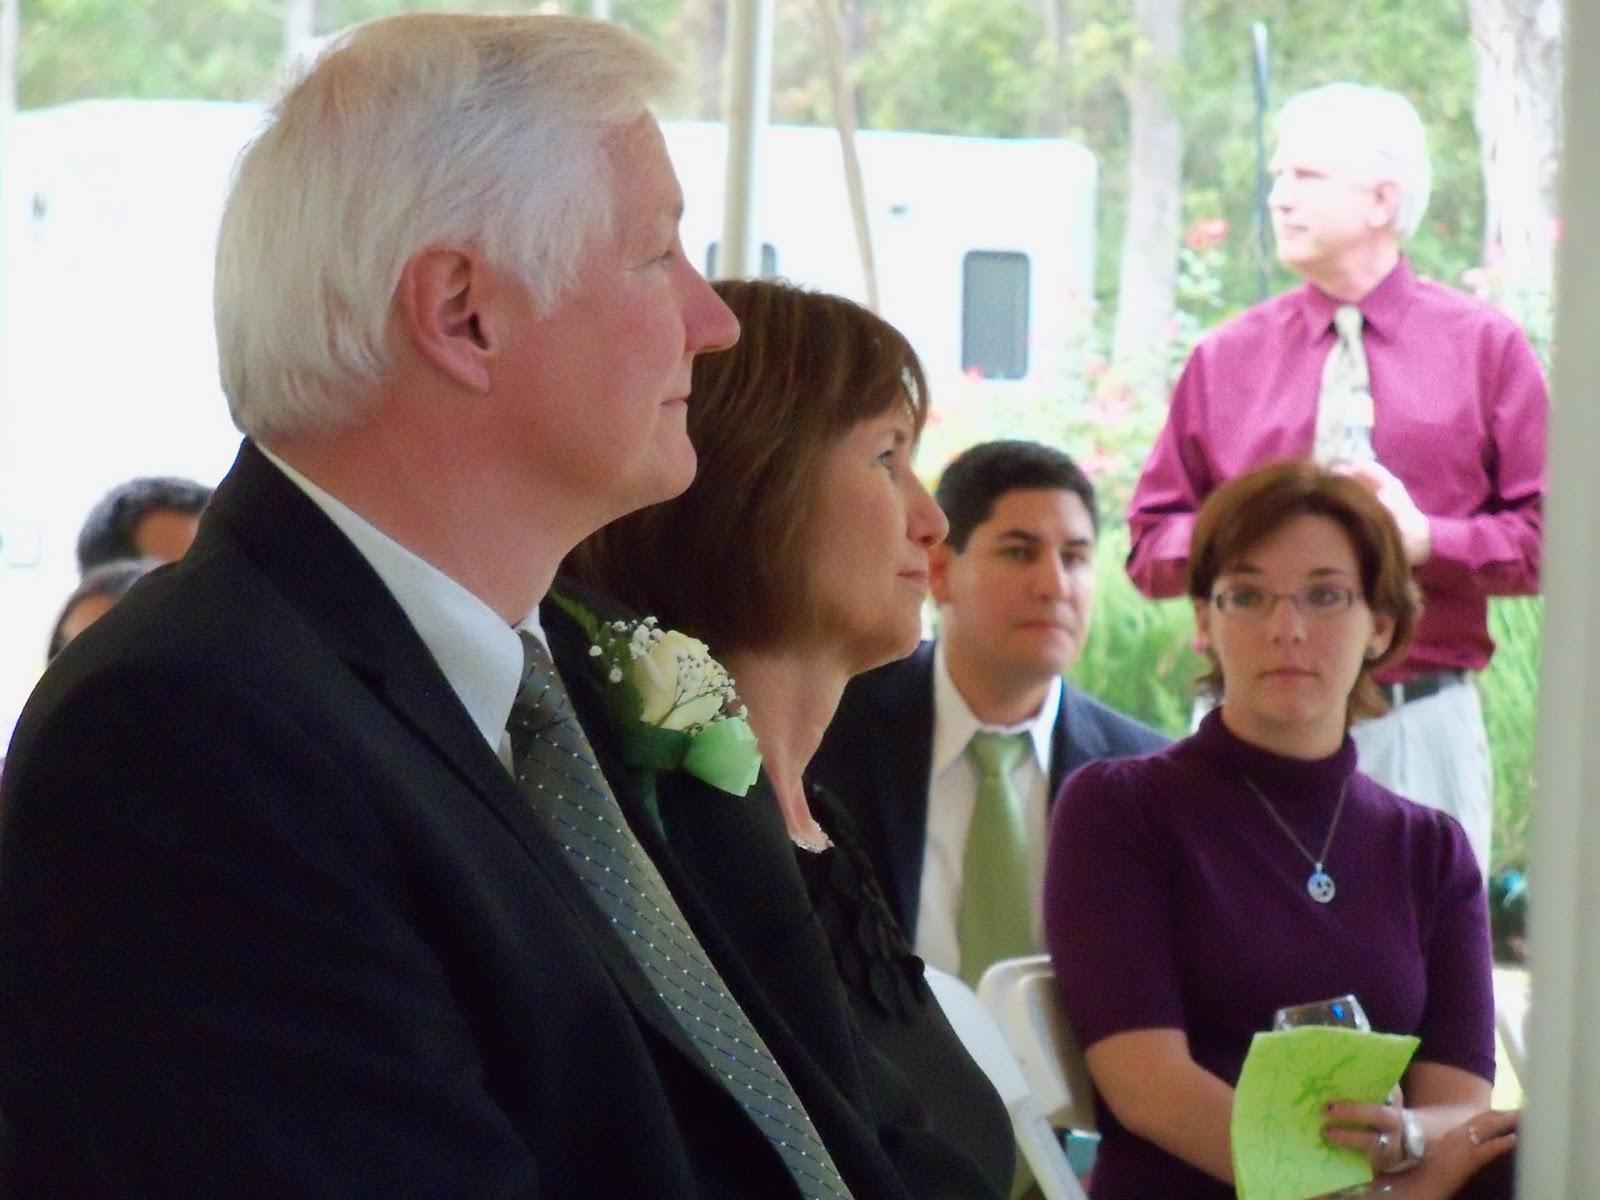 Ben and Jessica Coons wedding - 115_0798.JPG